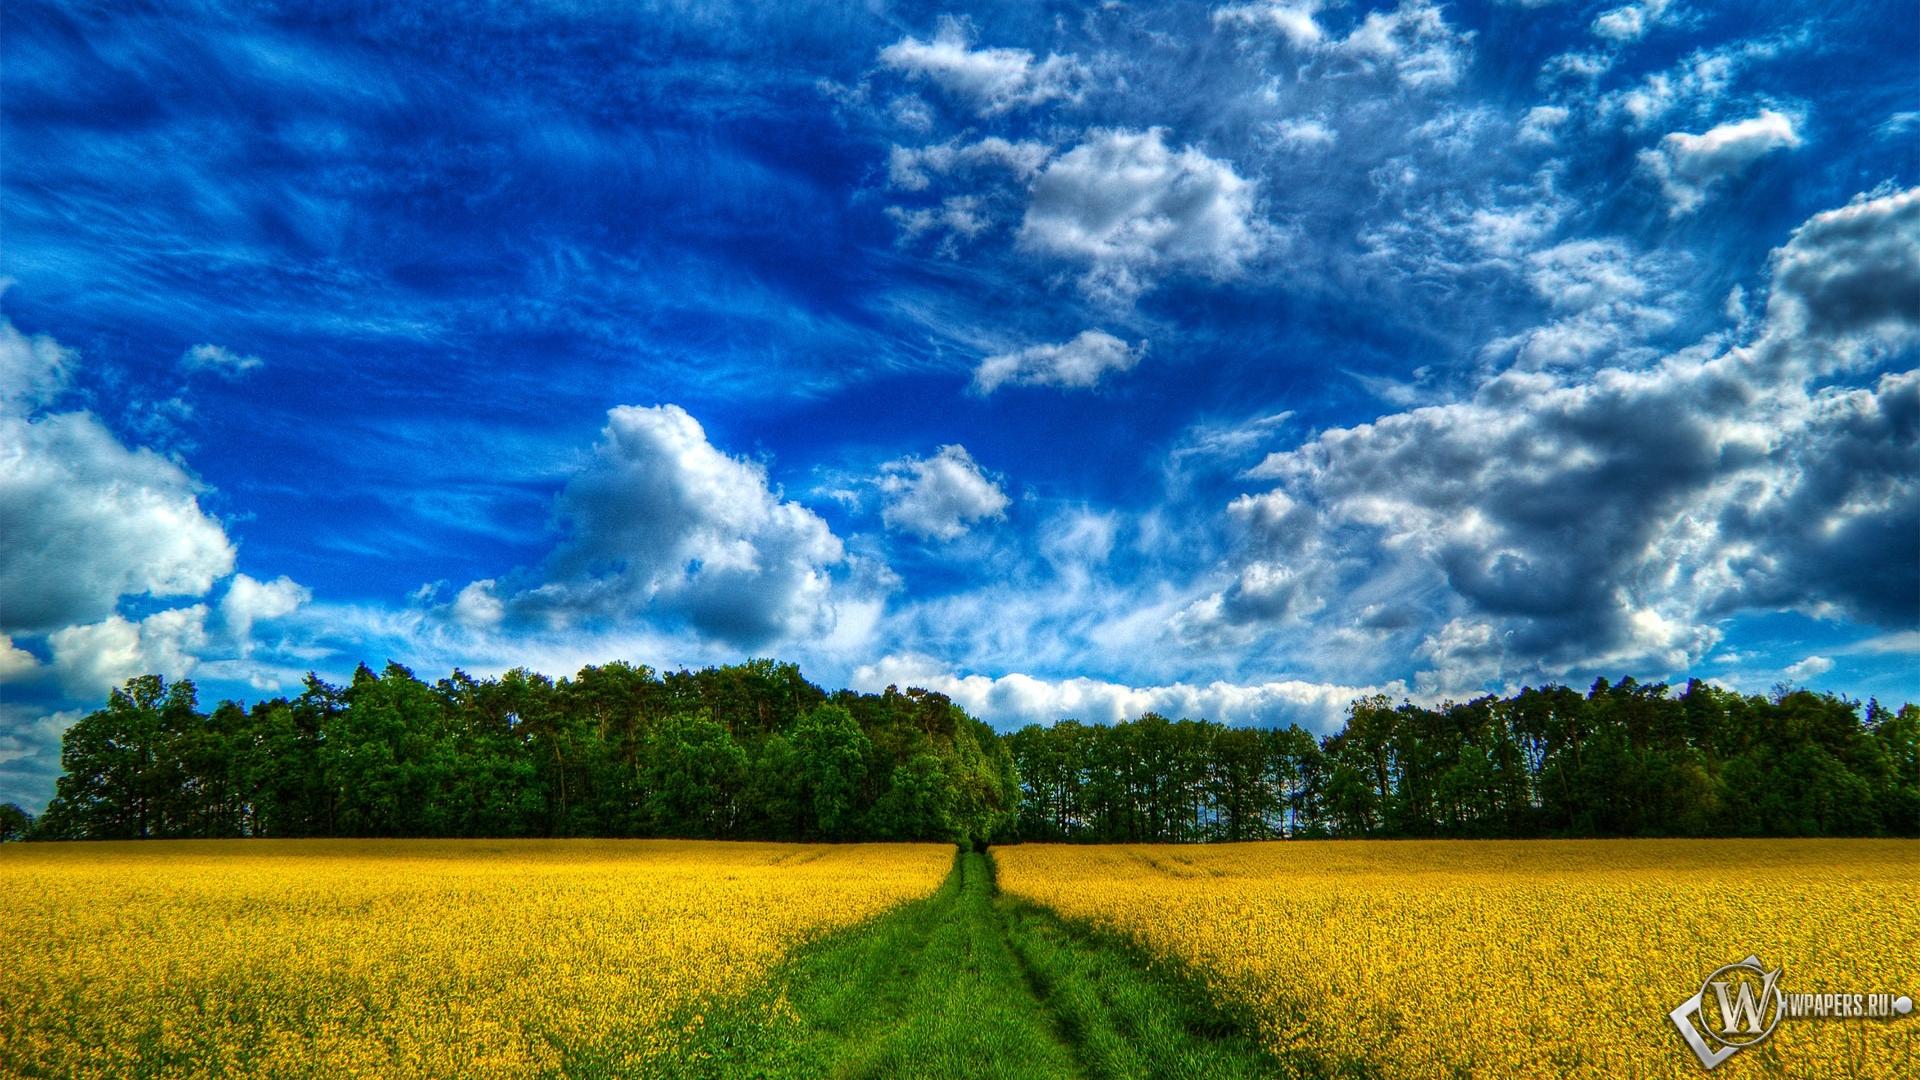 Обои дорога в лес дорога лес поле